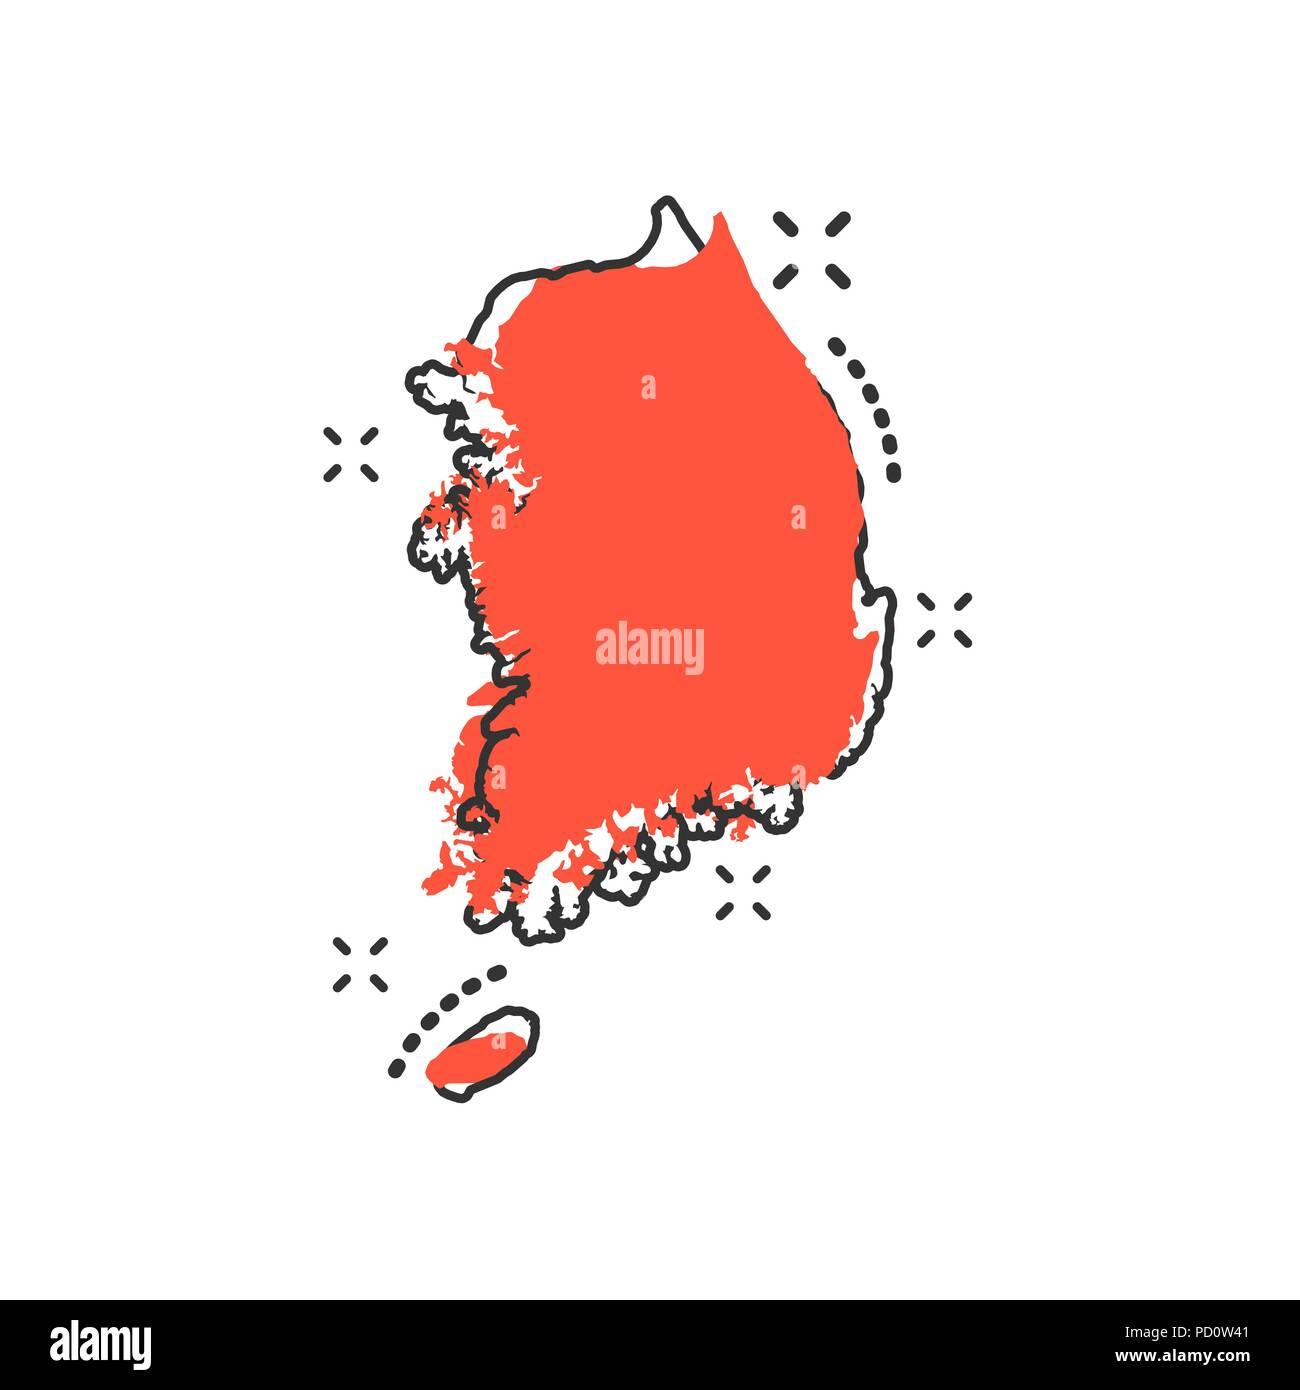 6a6a5b39e49c Vector cartoon South Korea map icon in comic style. South Korea sign  illustration pictogram.